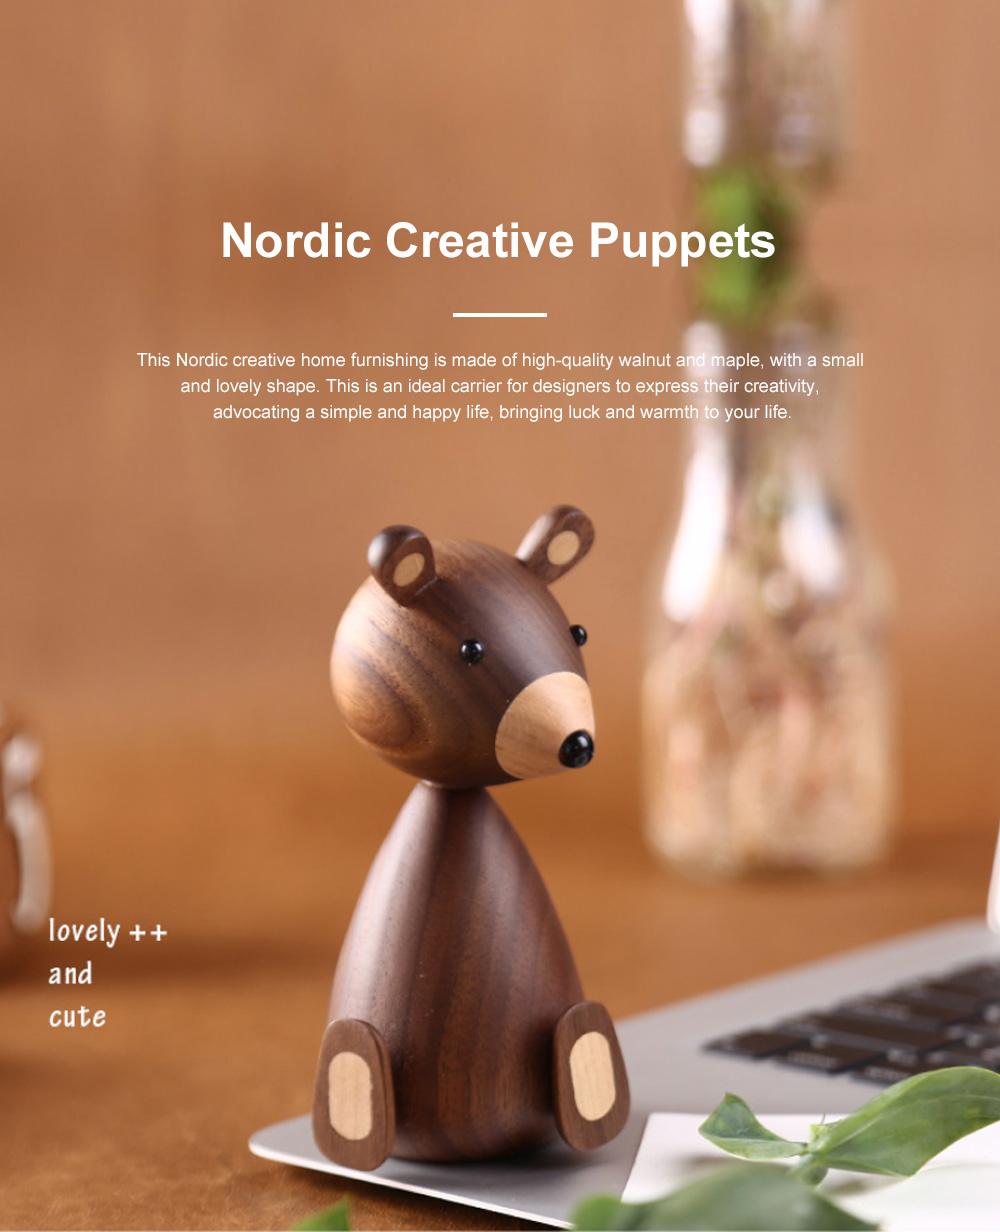 Nordic Creative Puppets Walnut Bears Danish Squirrels Creative Home Furnishings Birthday Gifts 0